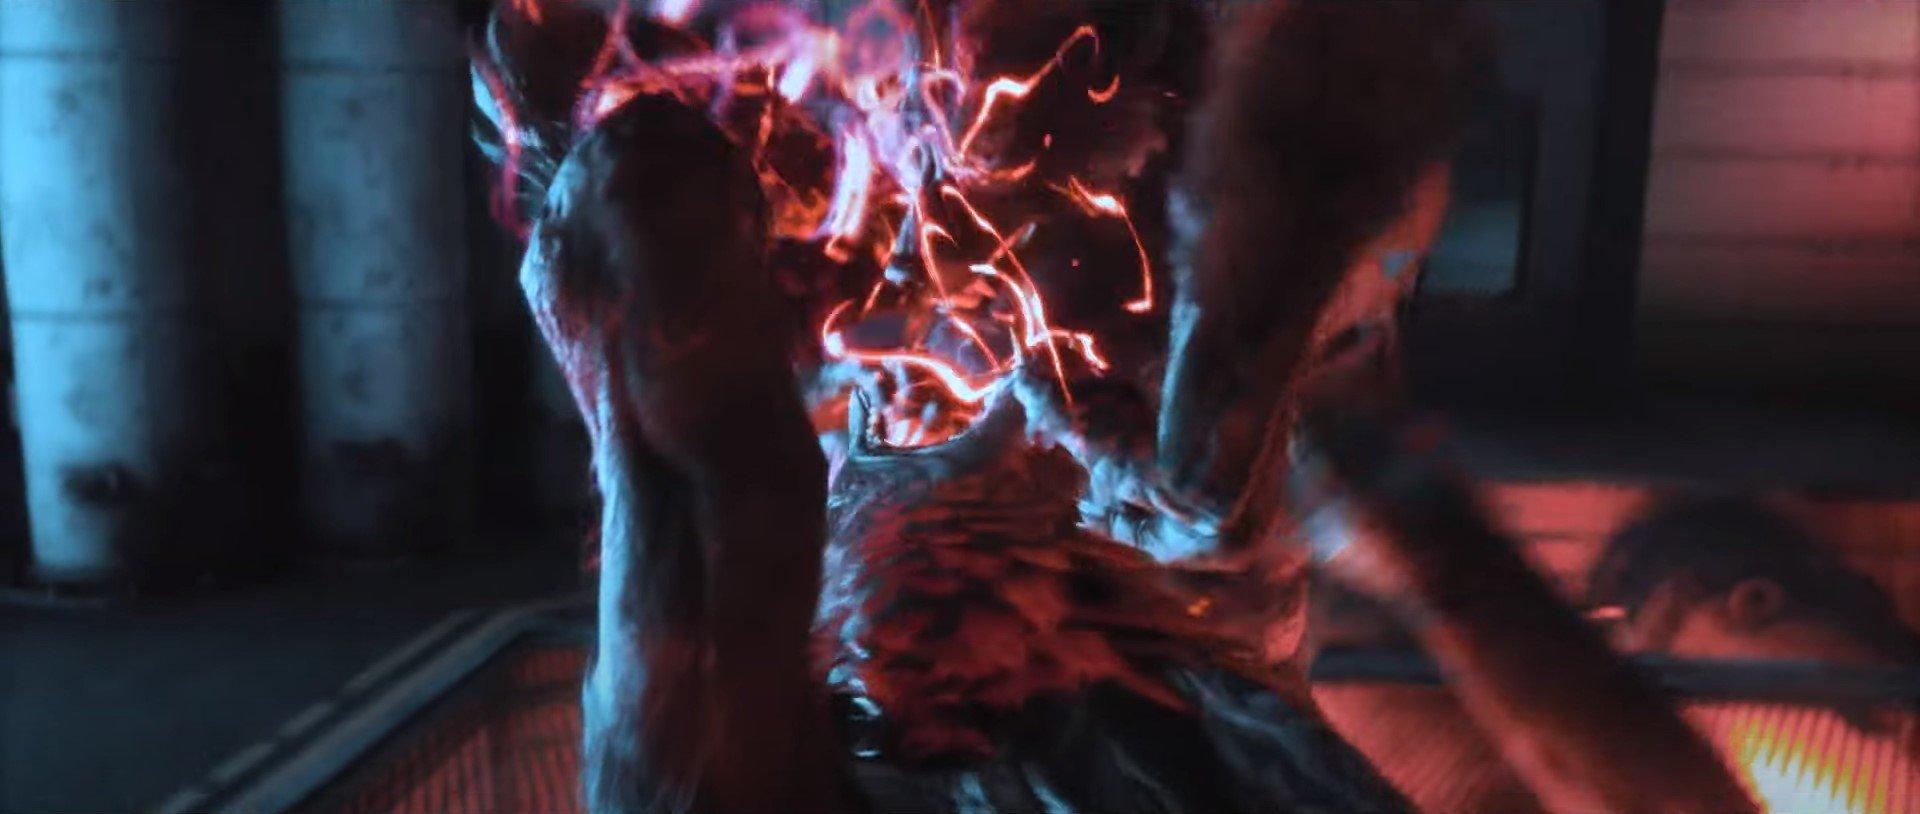 Werewolf-The-Apocalypse-Earthblood-Exécution-Autre-Loup-Garou